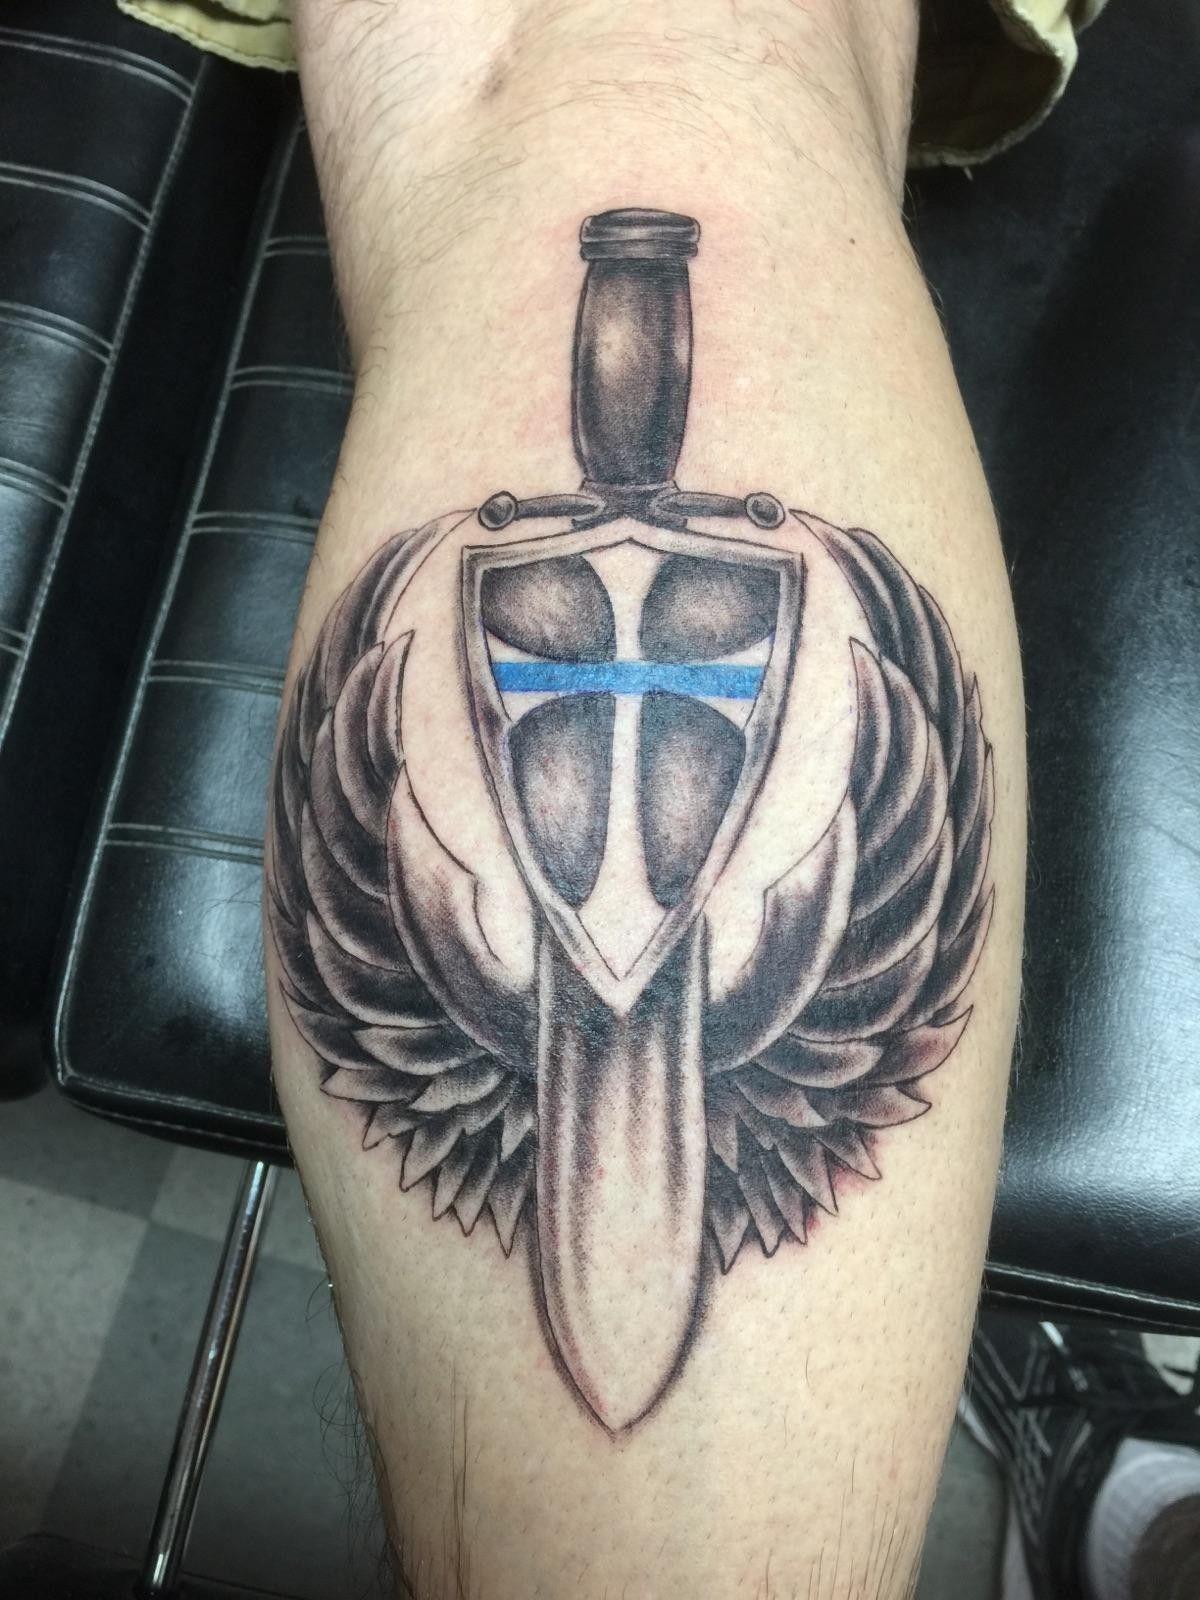 211f945e1 Saint Michael Tattoo in st. michael police tattoo - google search … |  pinteres…